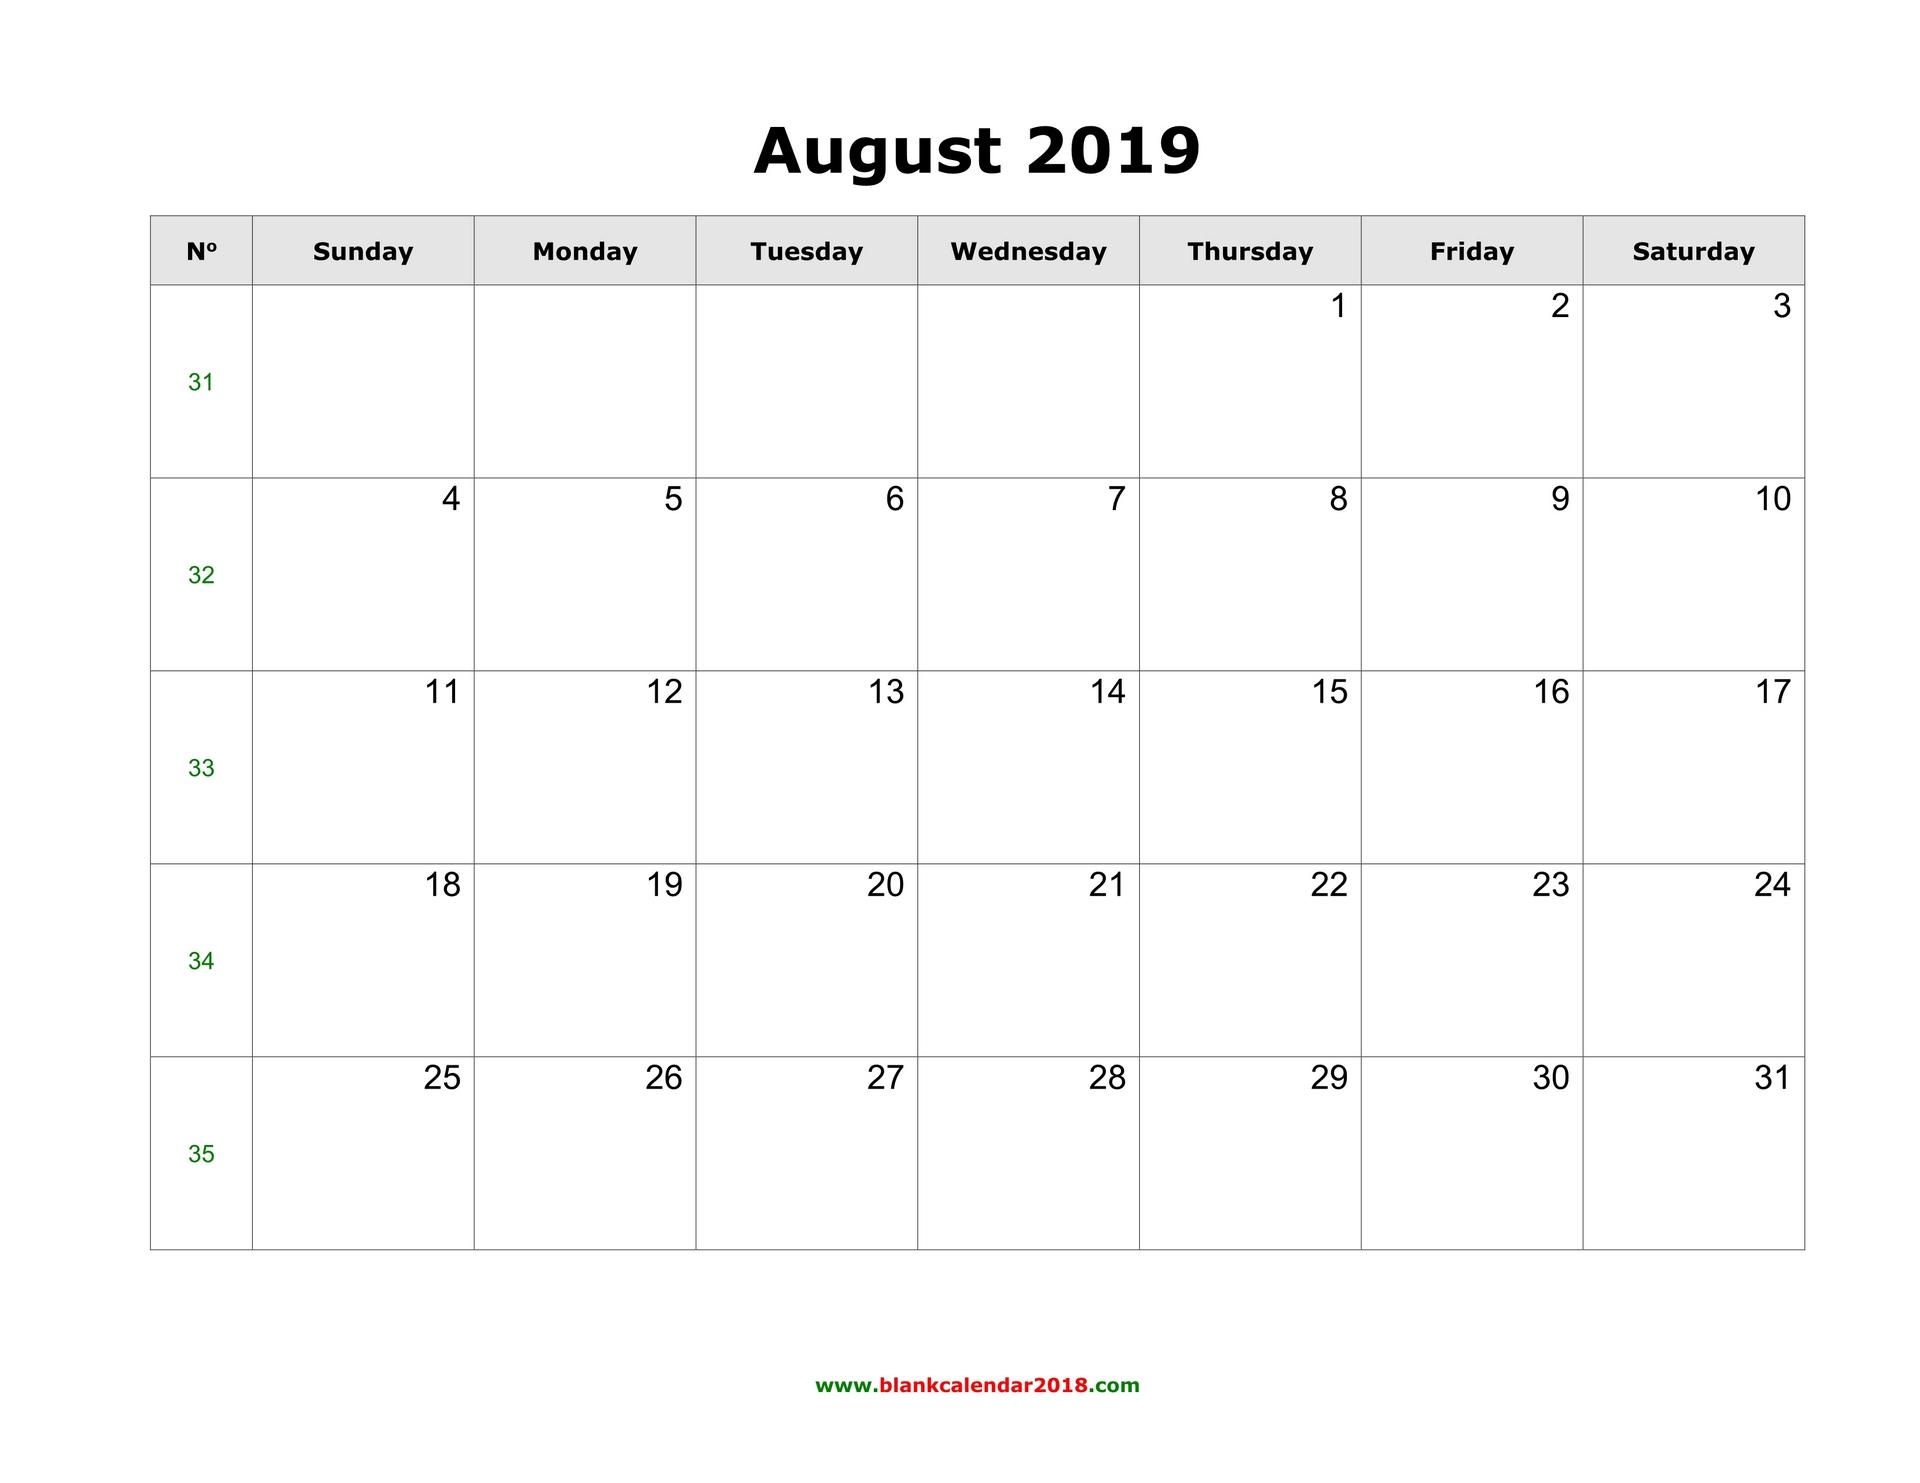 Blank Calendar For August 2019 regarding August Blank Calendar Pages